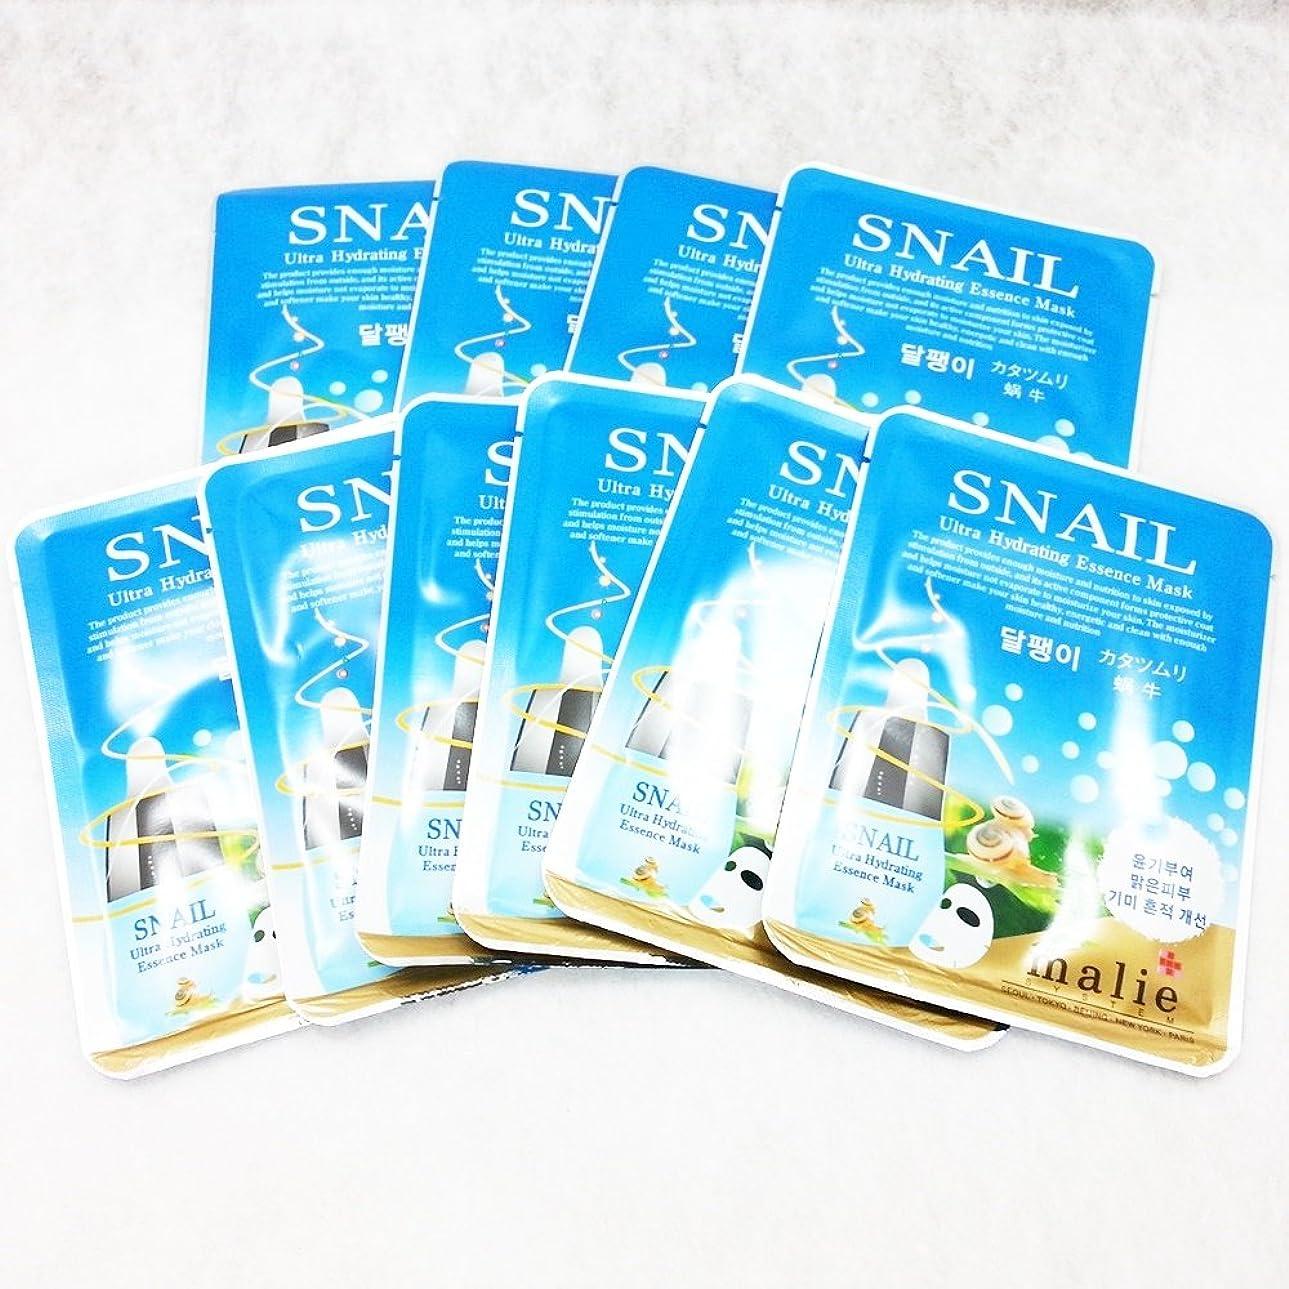 malie☆マリエ SNAIL Ultra HydratingEssenceMask カタツムリパック 10枚セット[並行輸入品]